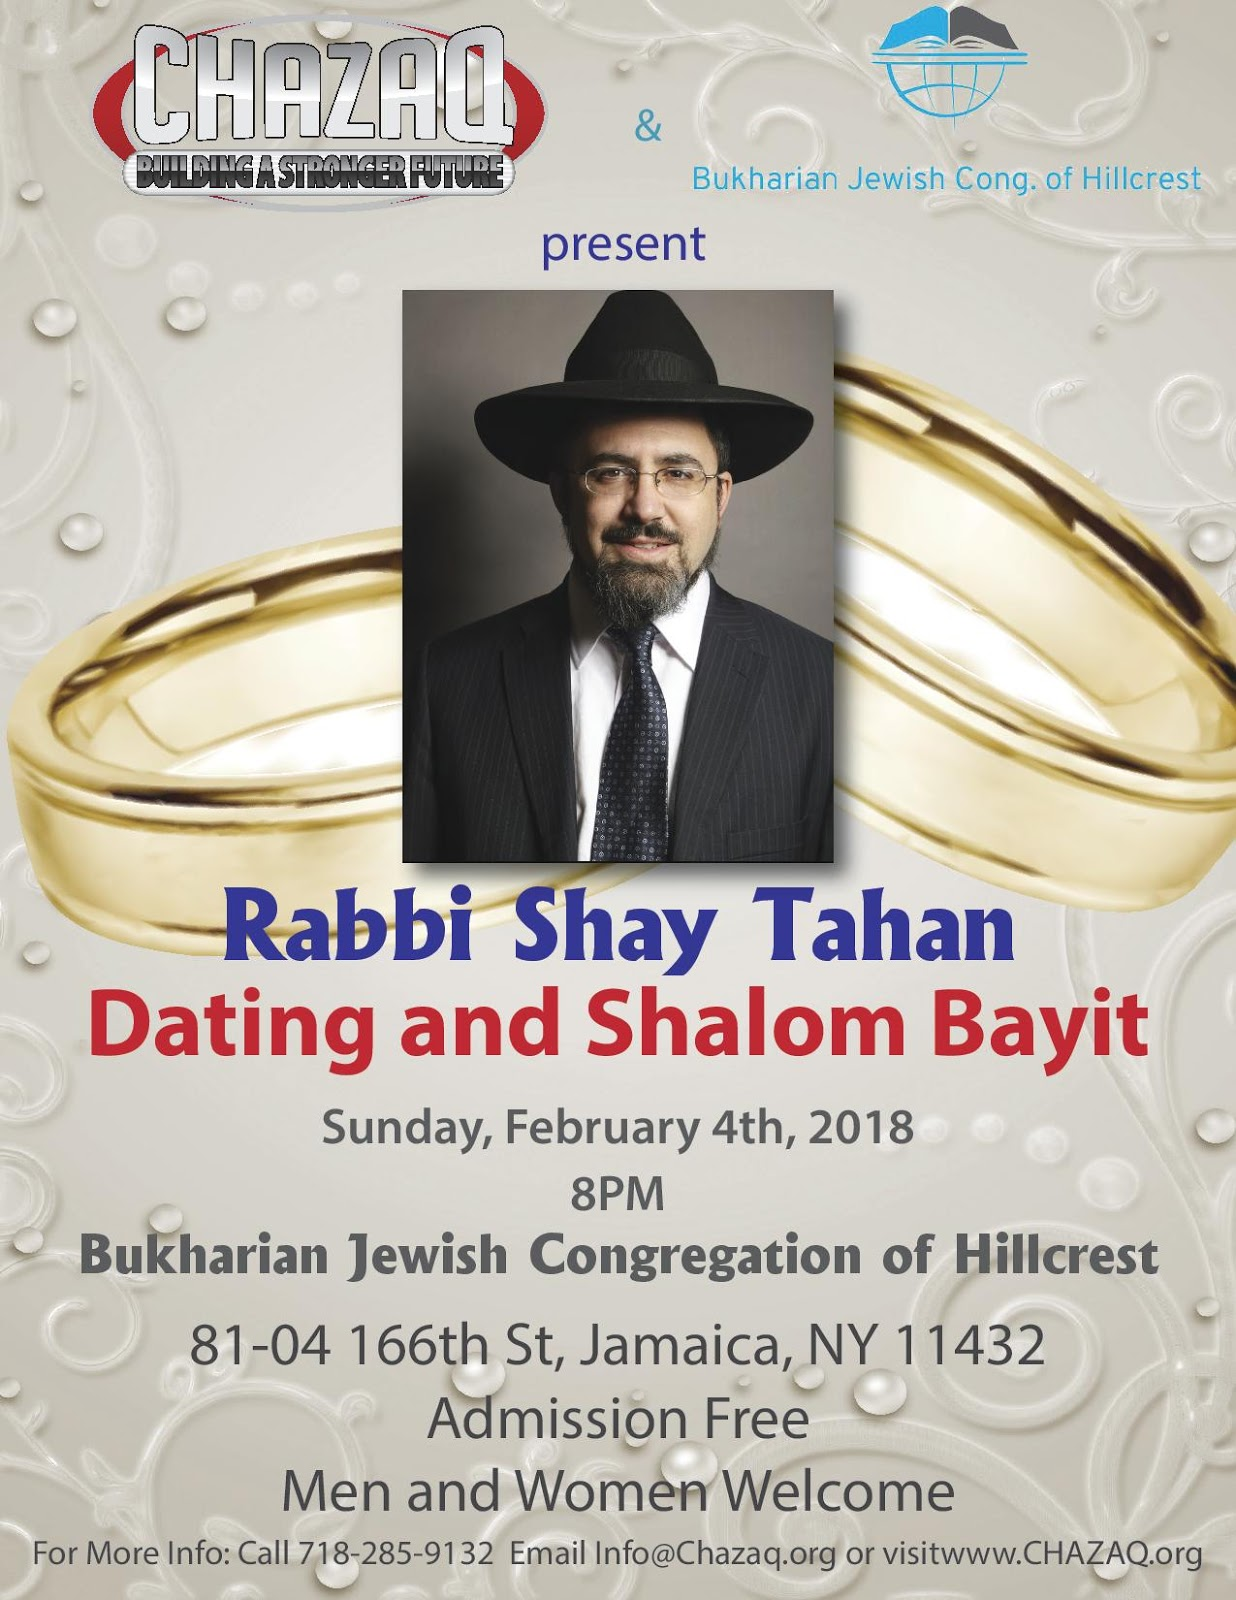 CHAZAQ: Rabbi Shay Tahan - Dating and Shalom Bayit